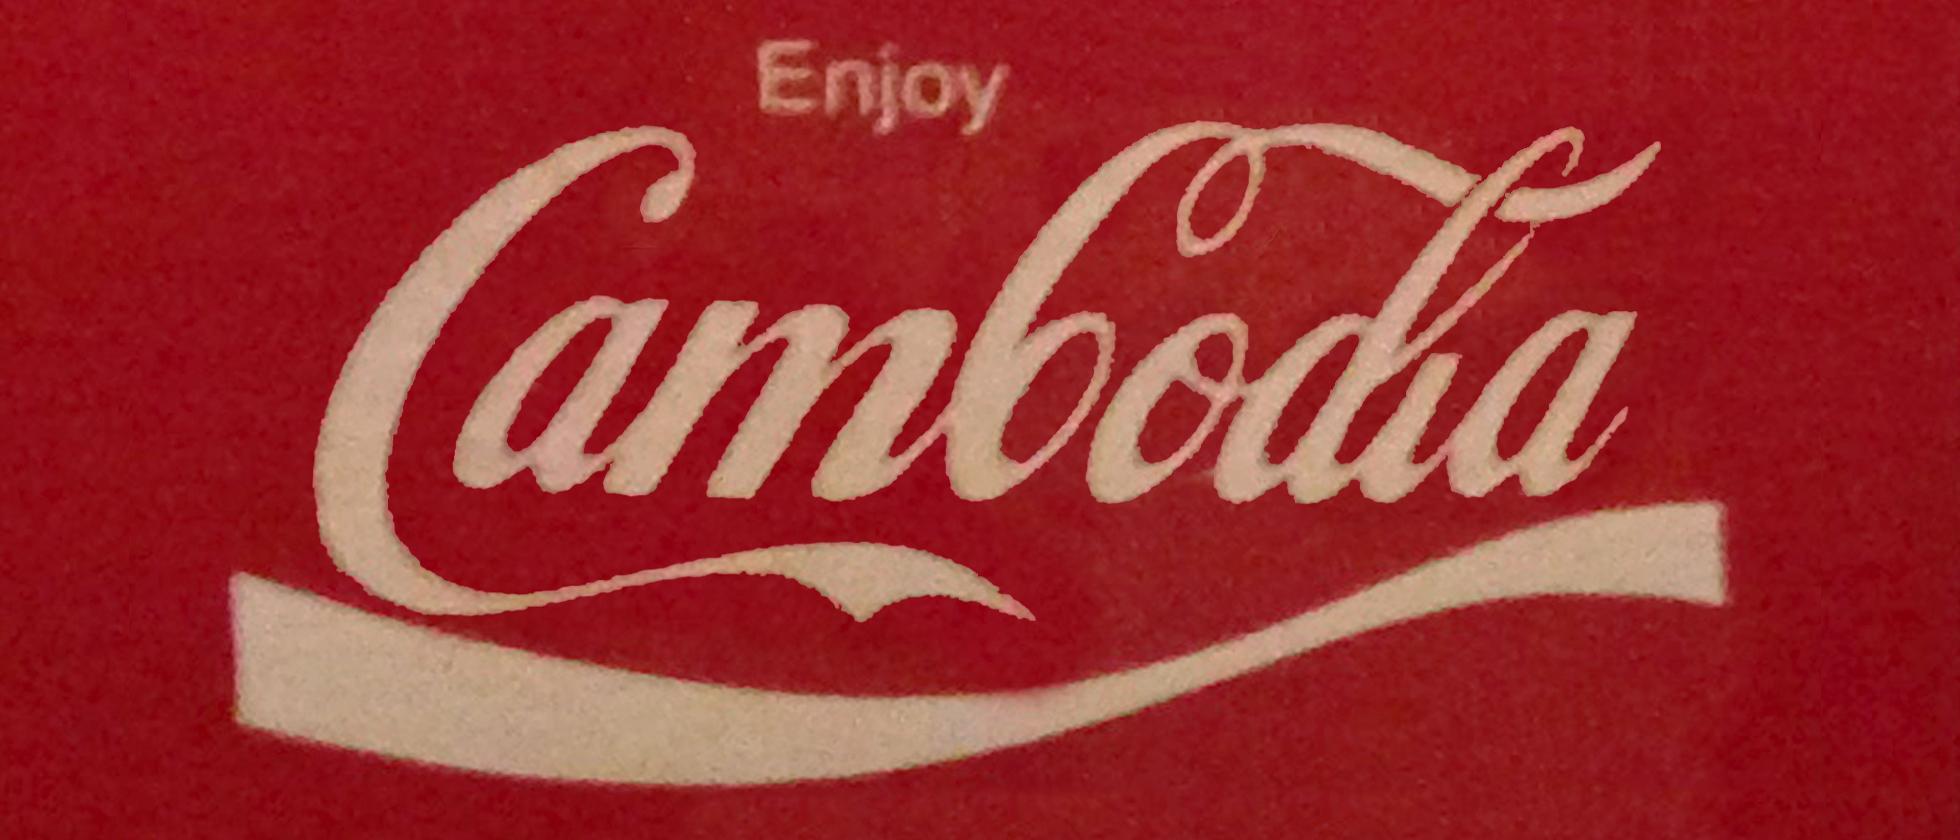 Een klein kijkje in Cambodja